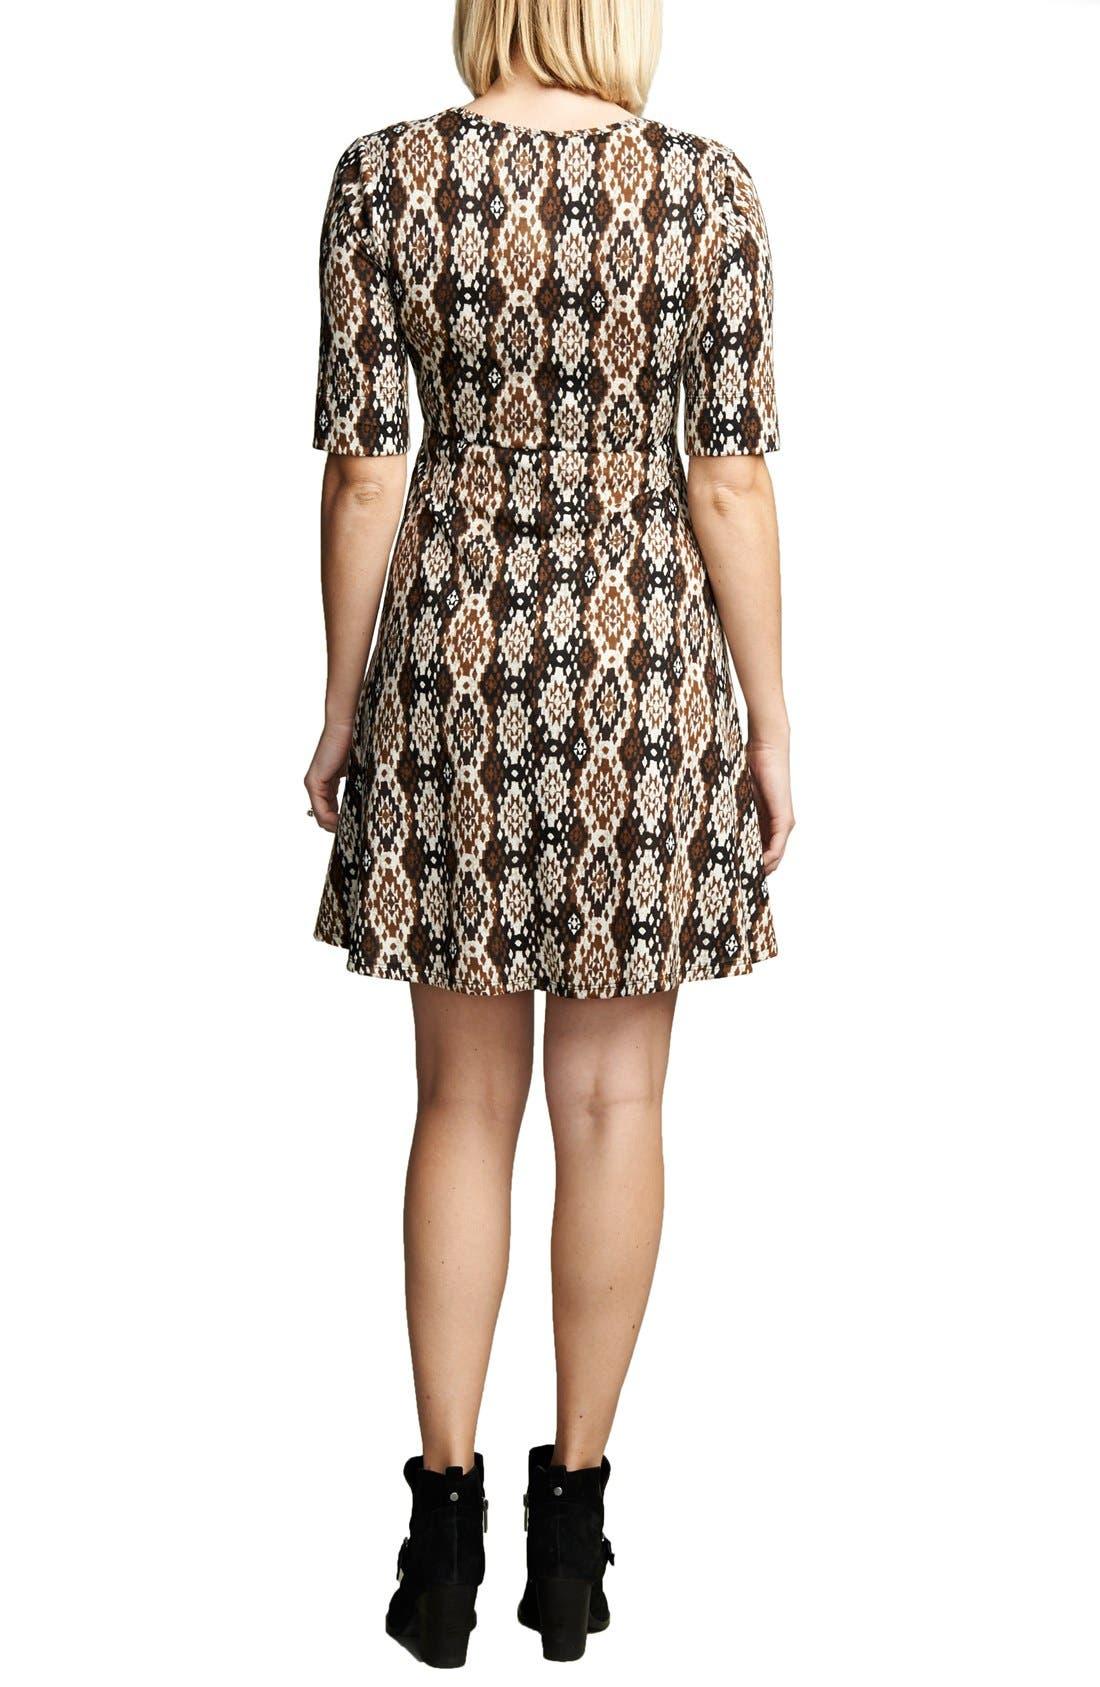 MATERNAL AMERICA, Print Tie Front Maternity Dress, Main thumbnail 1, color, IKAT PRINT